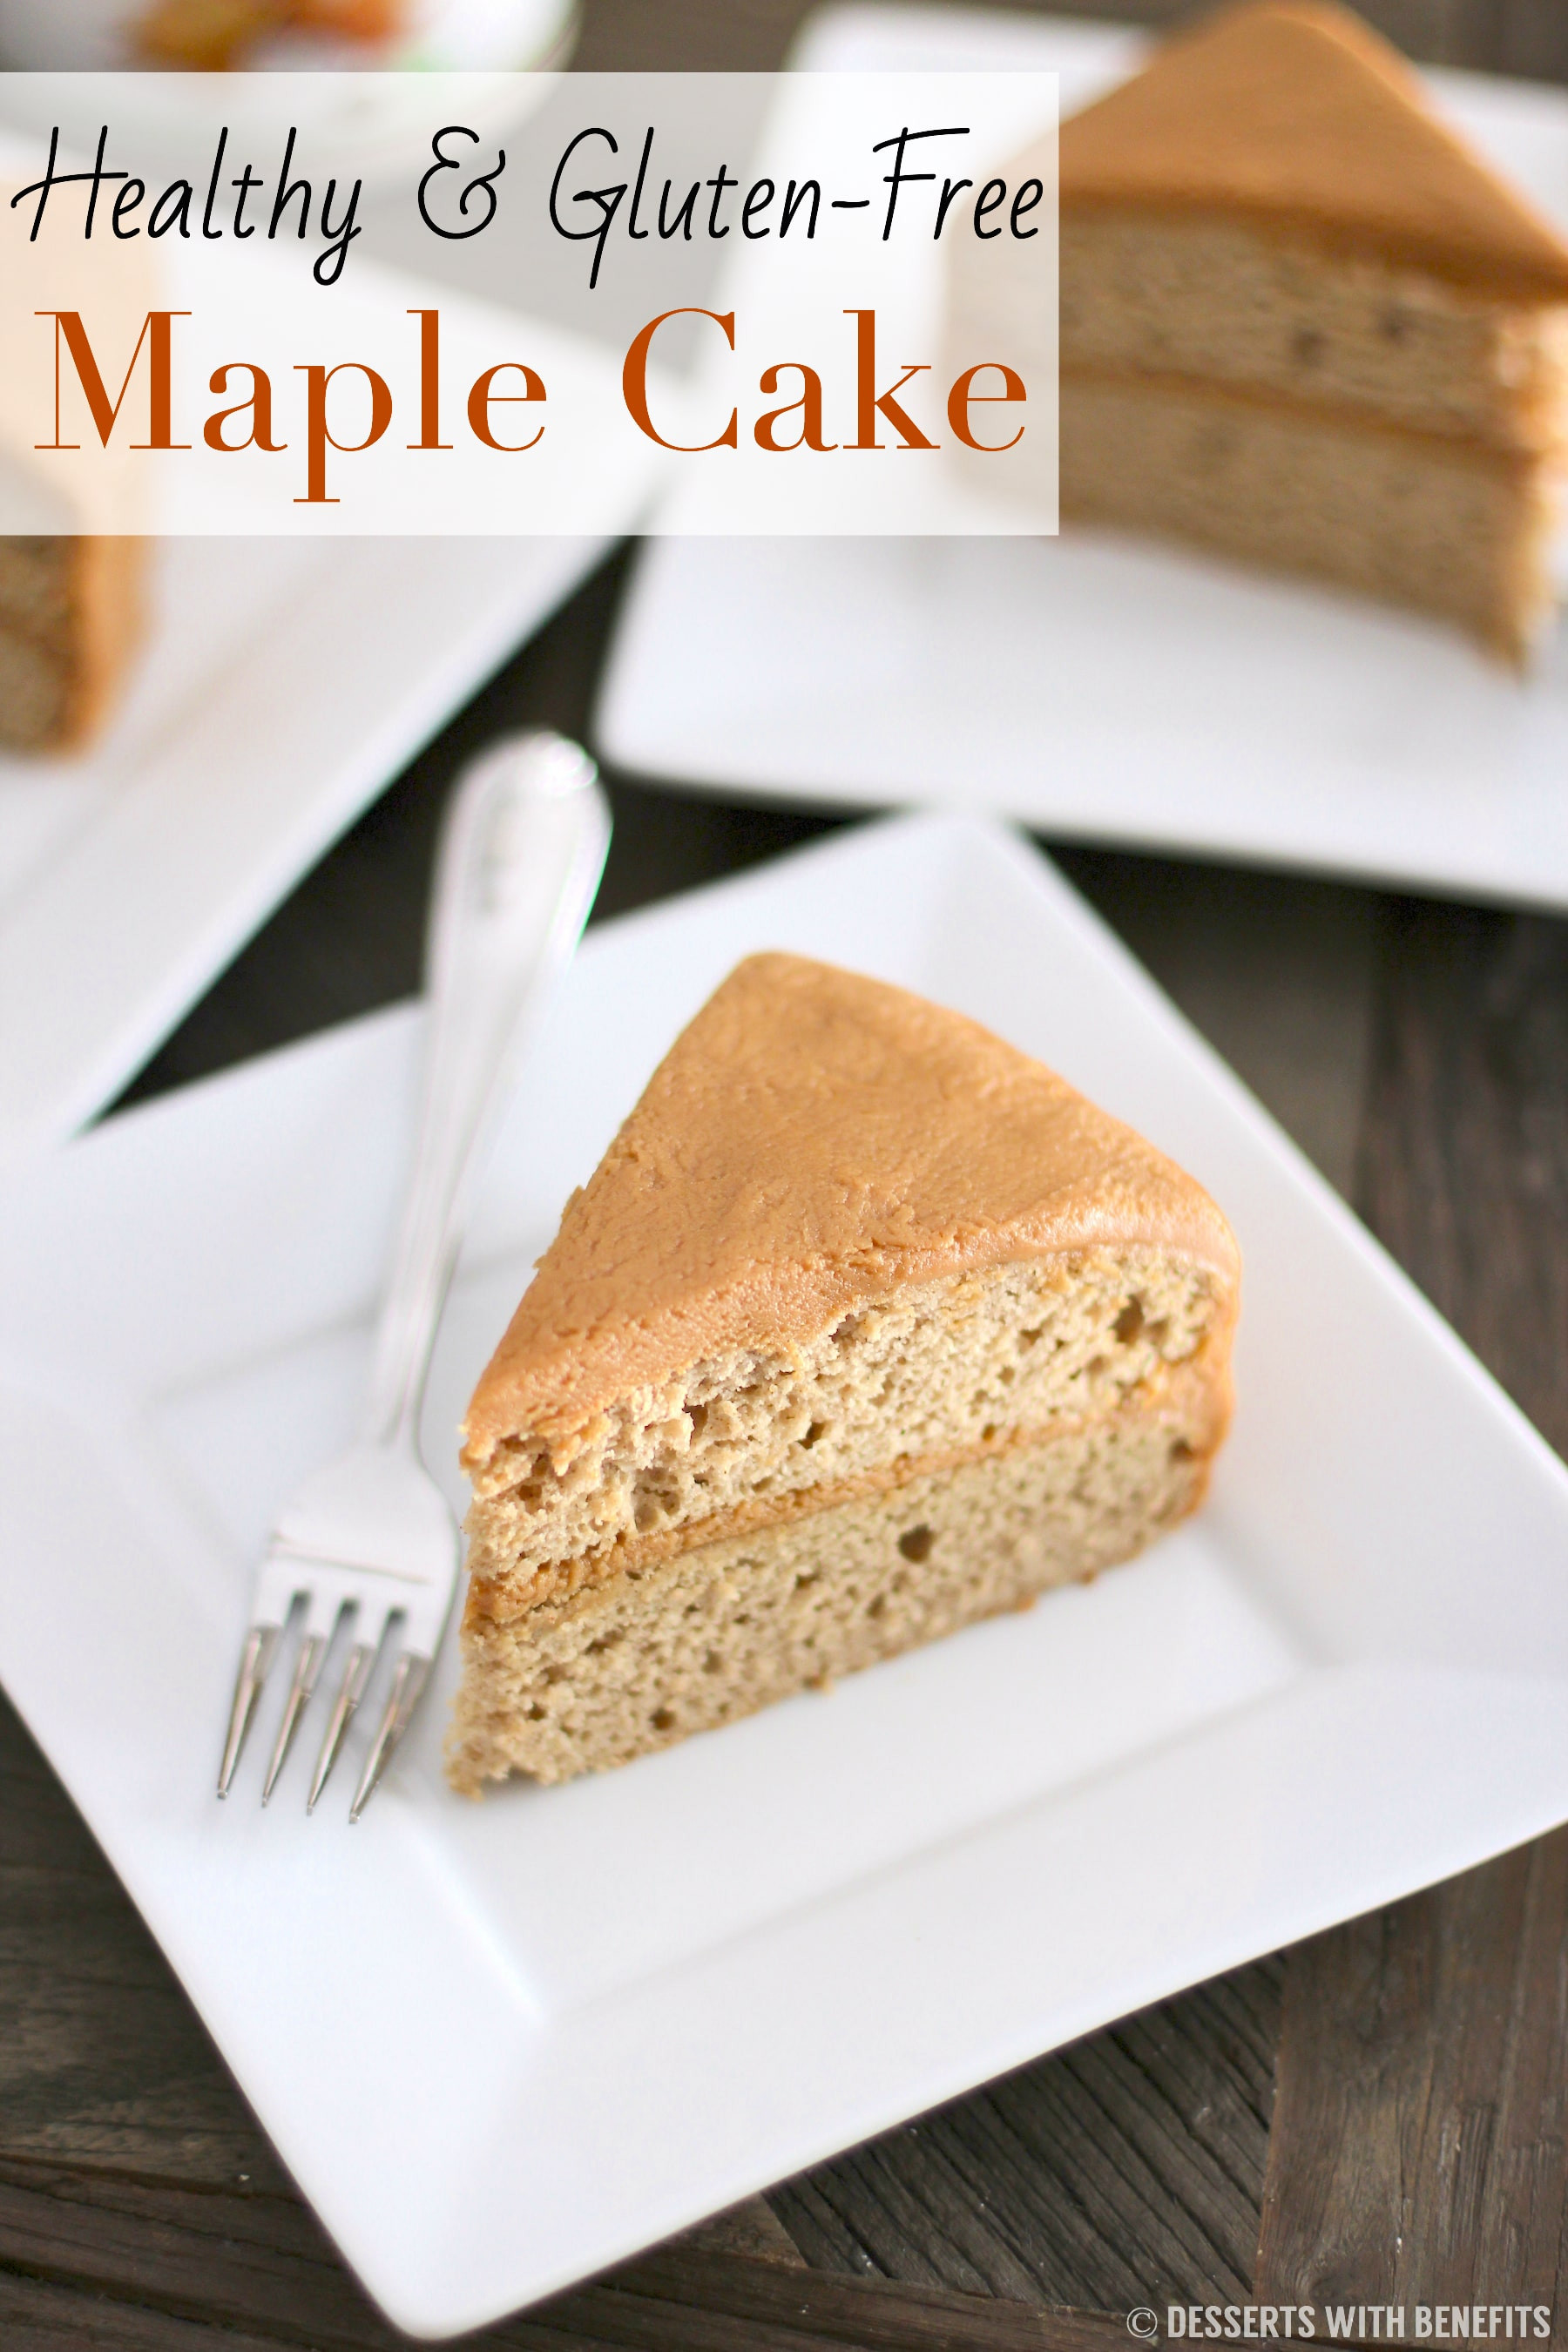 Gluten Free Dairy Free Dessert Recipes  Healthy Gluten Free Maple Cake Recipe